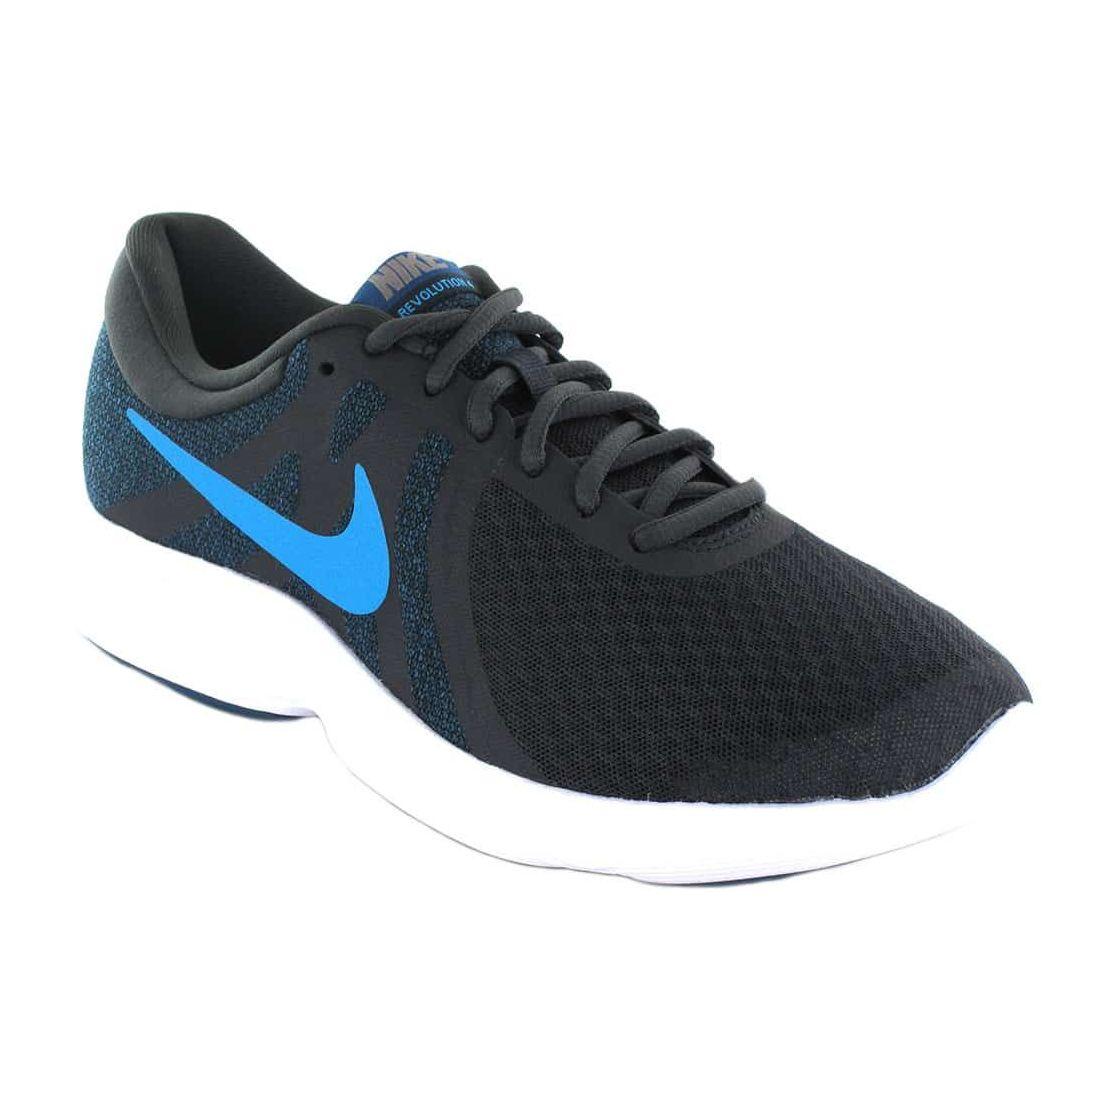 Nike Revolution 4 021 Nike Mens Running Shoes Running Shoes Running Sizes: 41, 42, 43, 44, 45, 46, 48,5, 49,5;